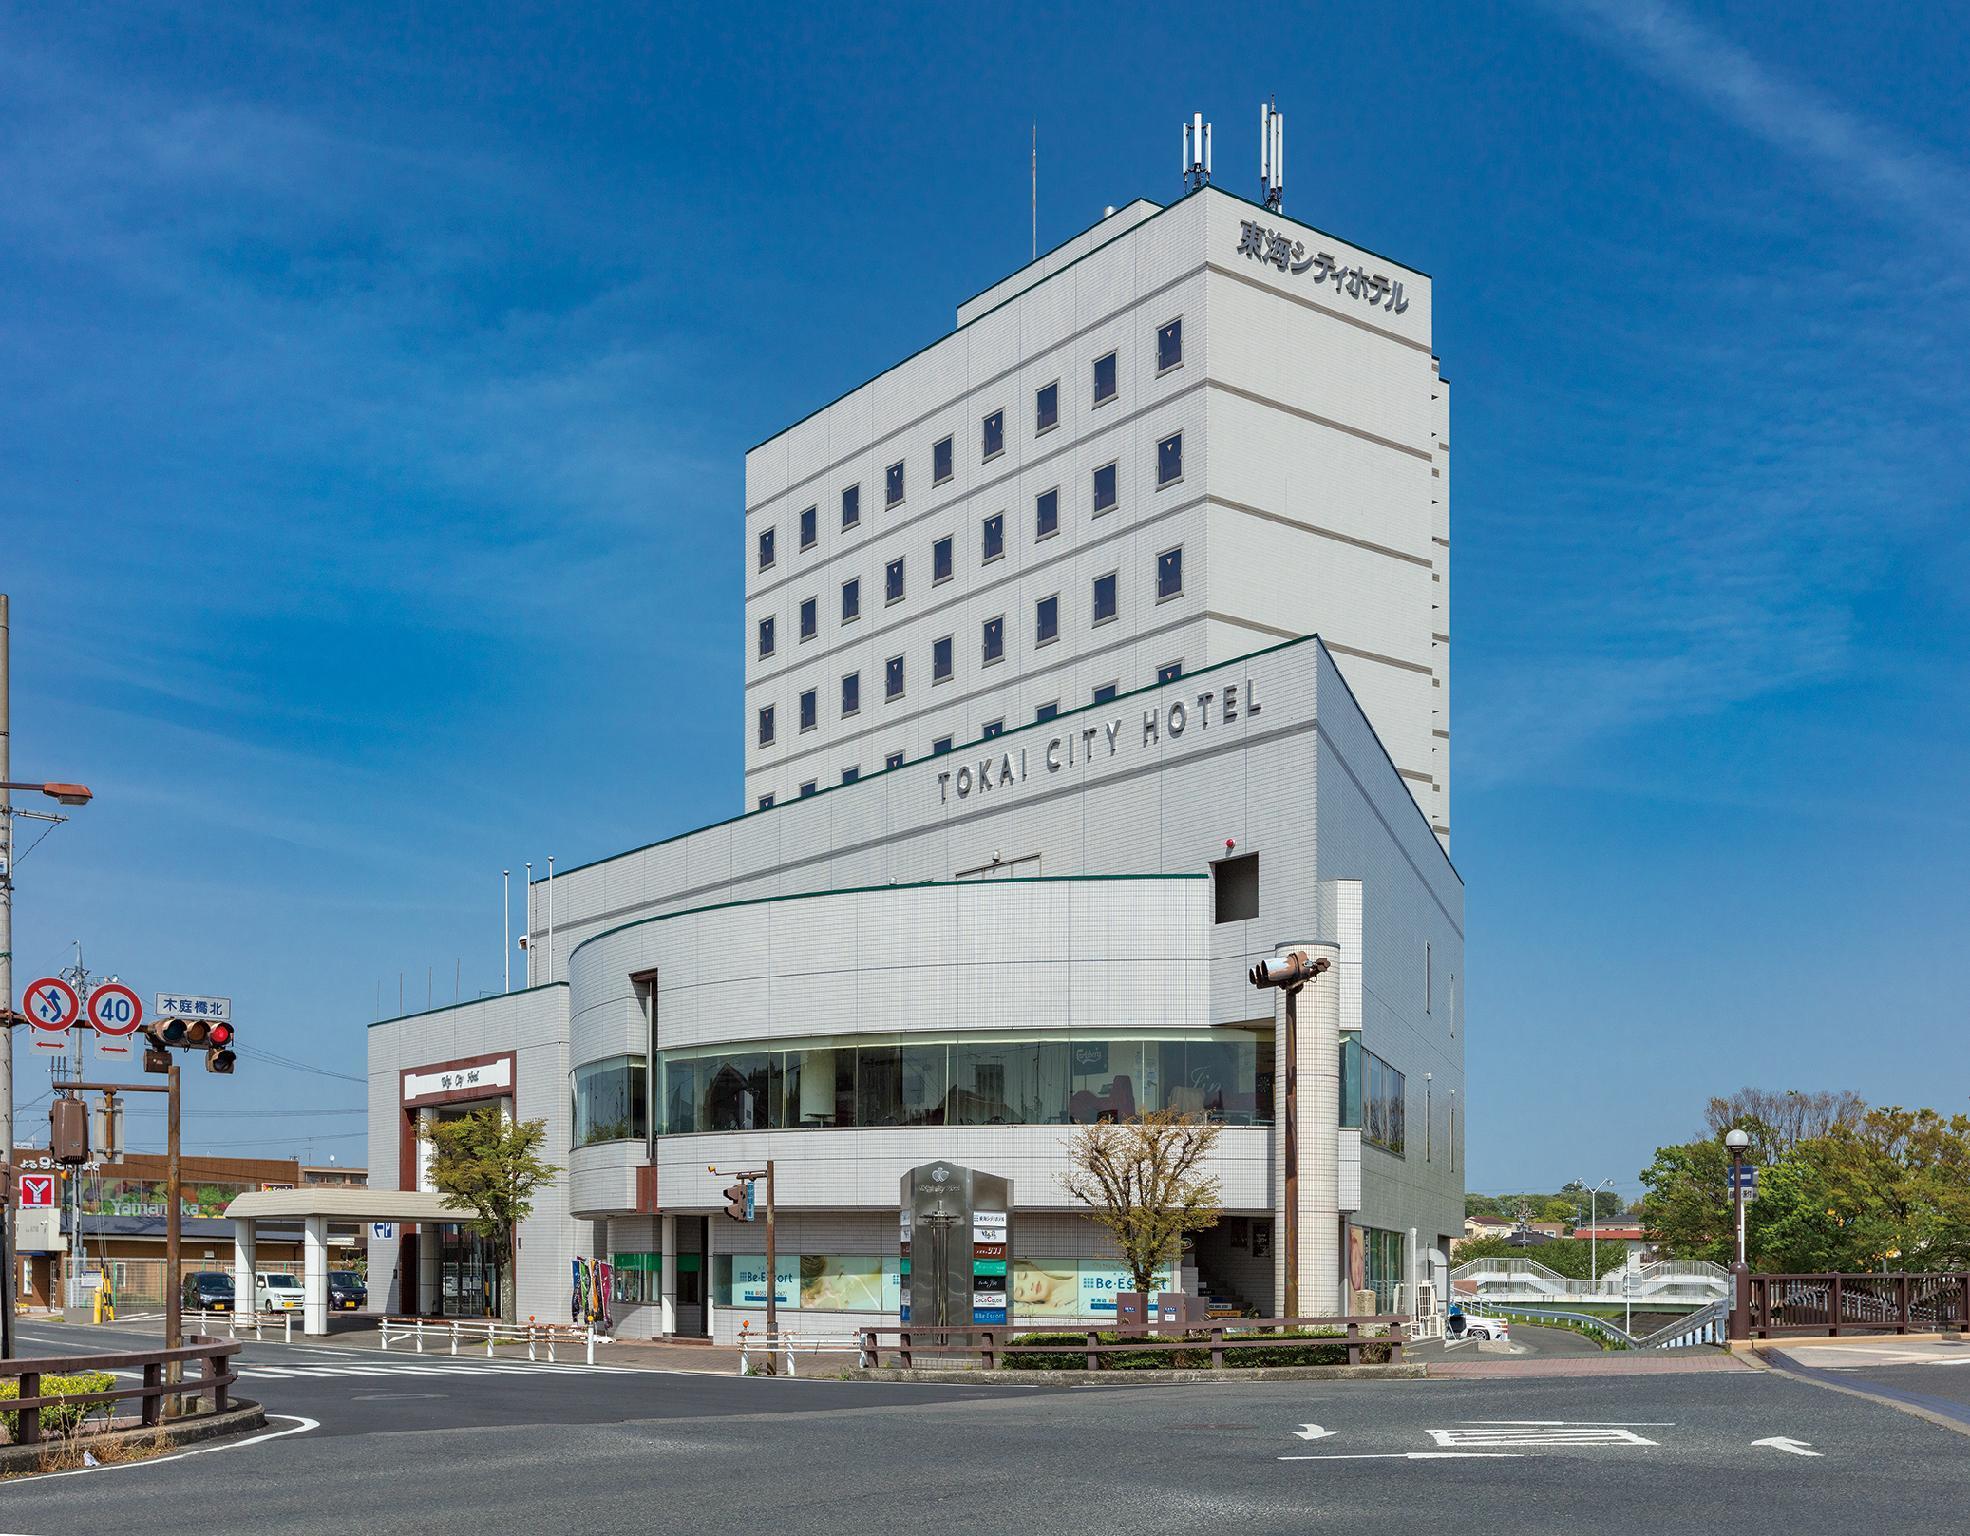 Tokai City Hotel